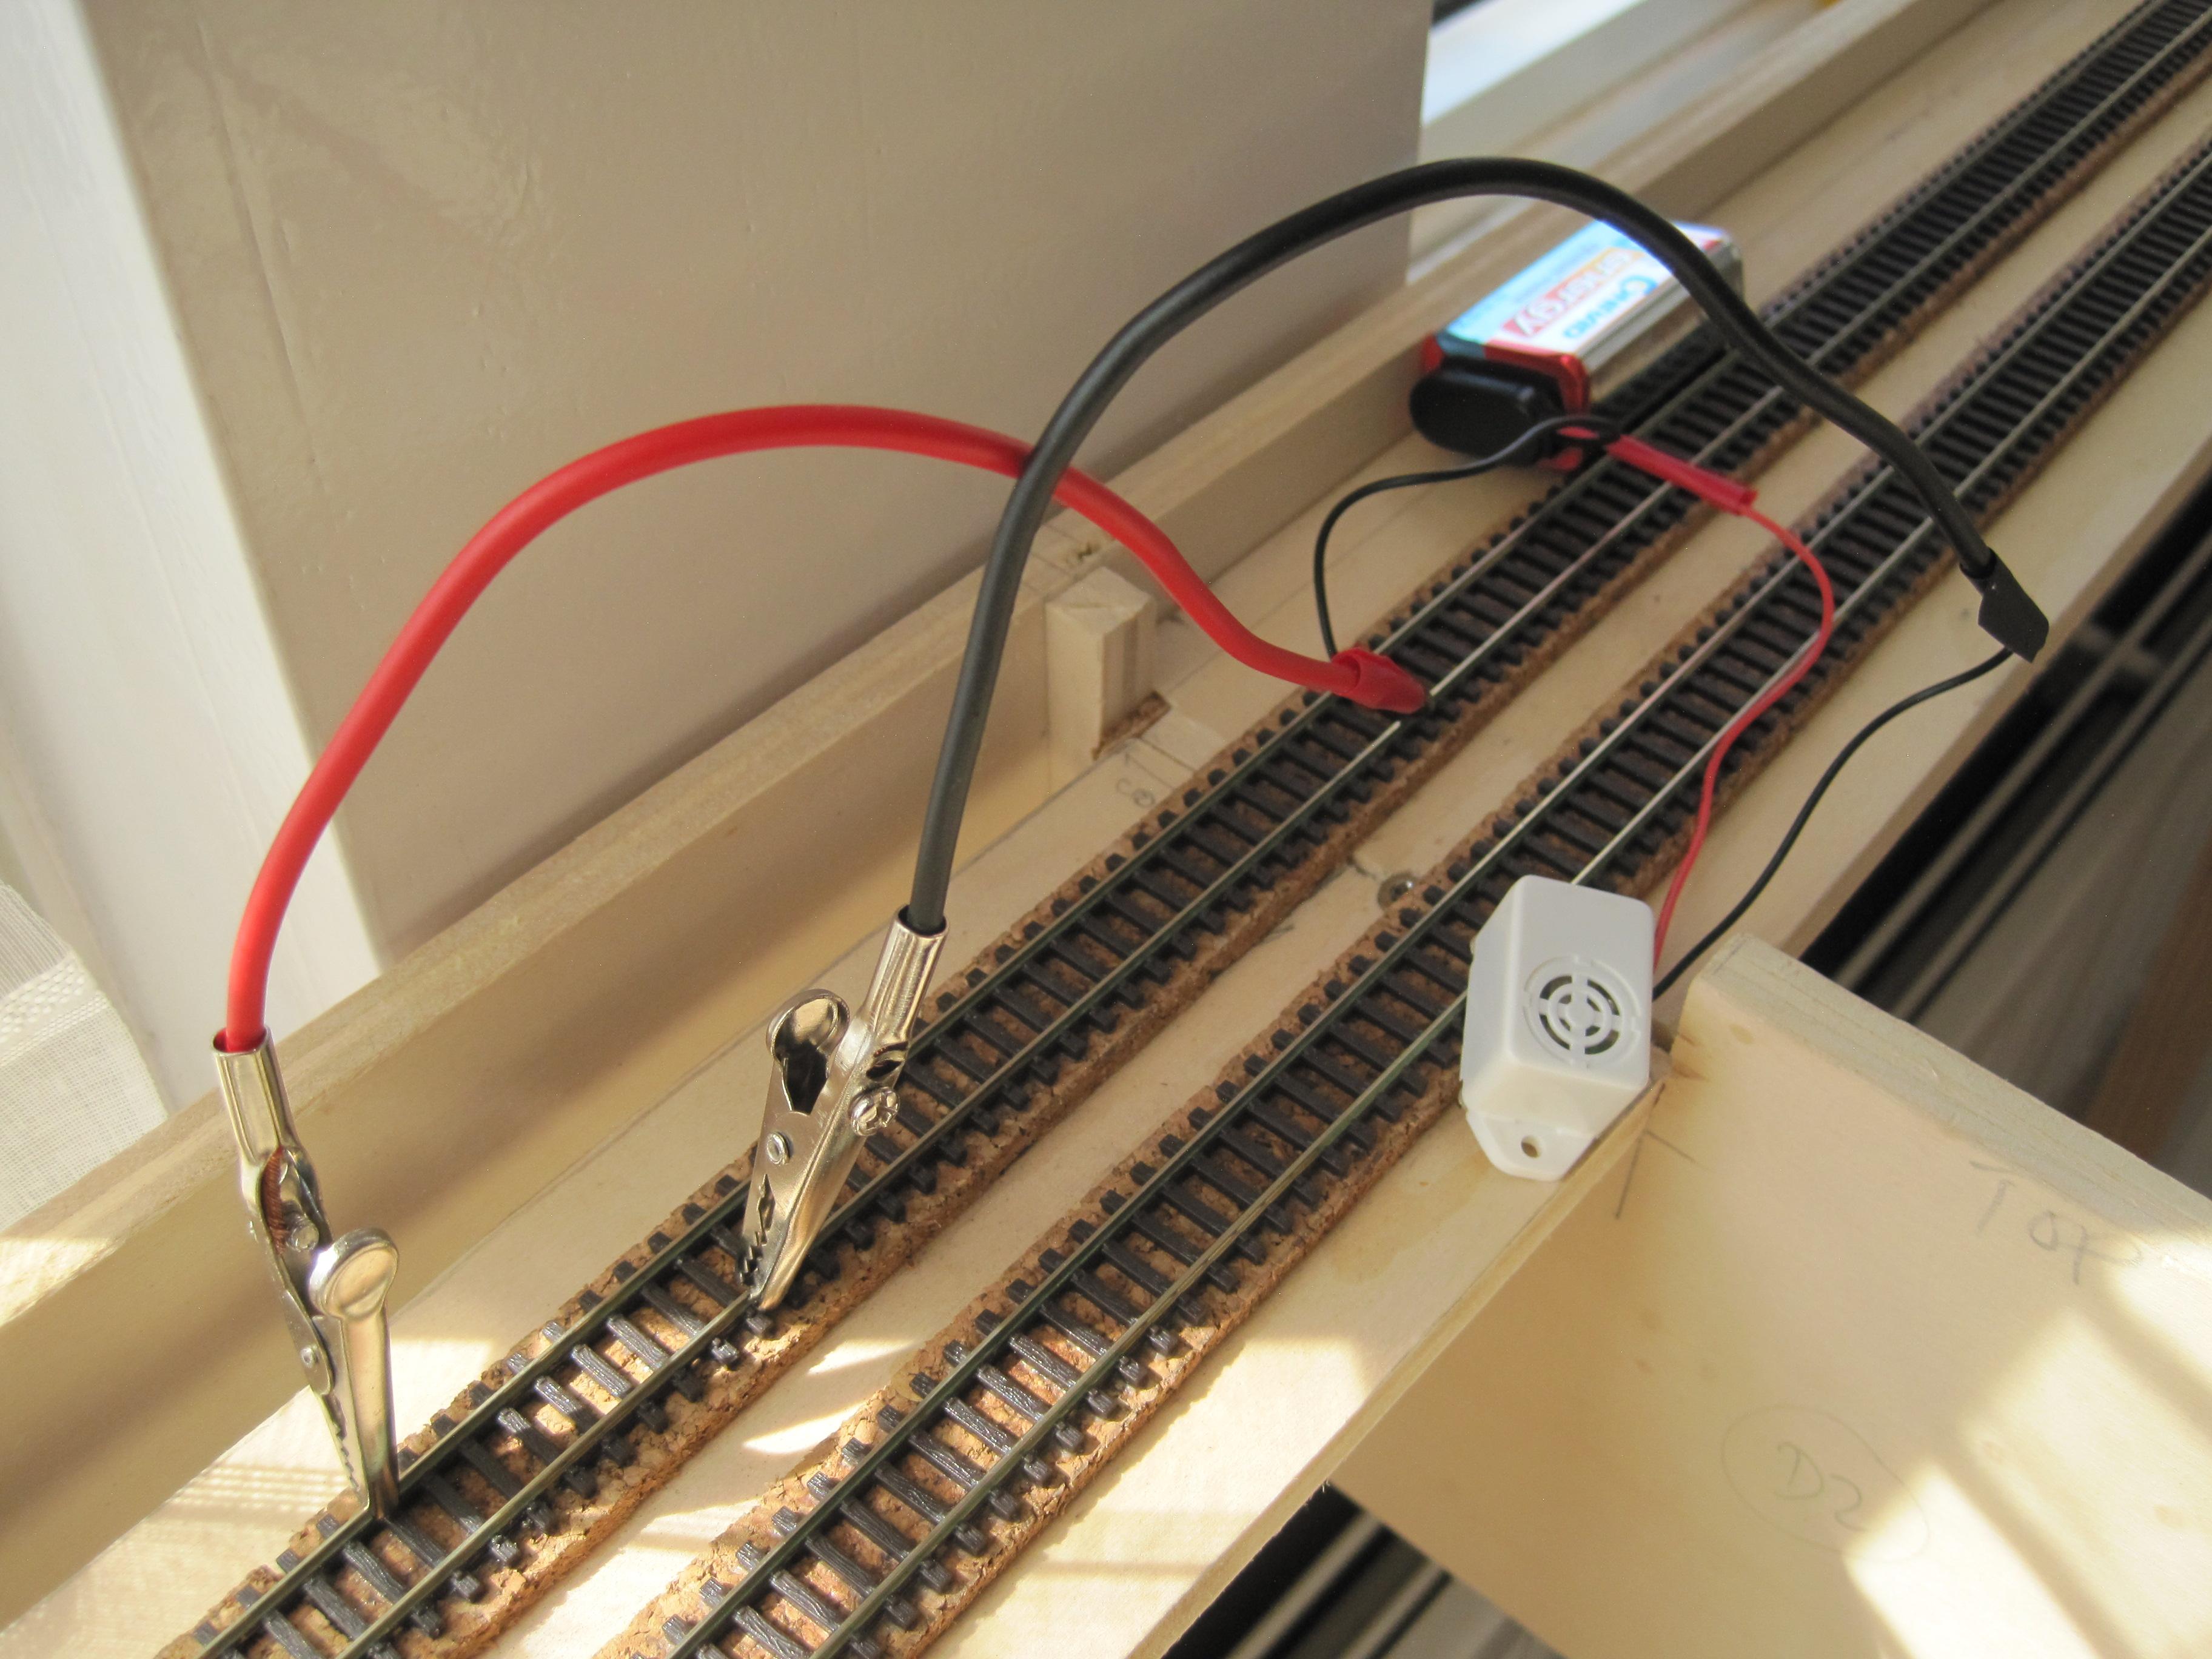 dcc model railway wiring diagrams ego c twist diagram track sgo vipie de schematic rh 81 twizer co ho scale